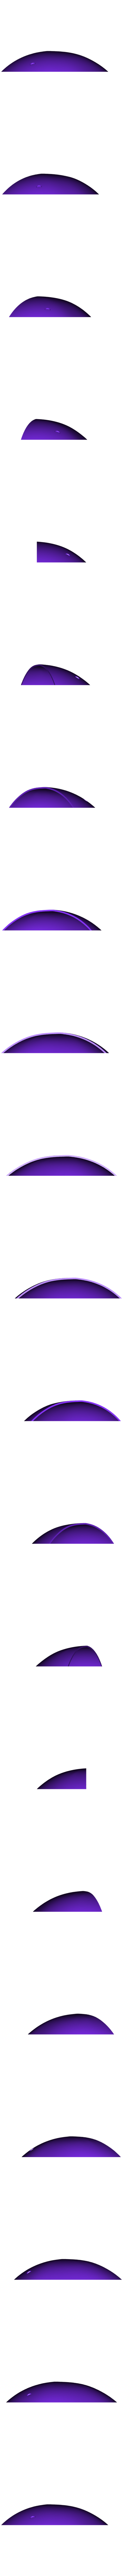 Hex3D_ImpGunner_Dome_Part1.stl Download STL file Imperial Gunner 3D Printable Helmet • 3D print design, Geoffro